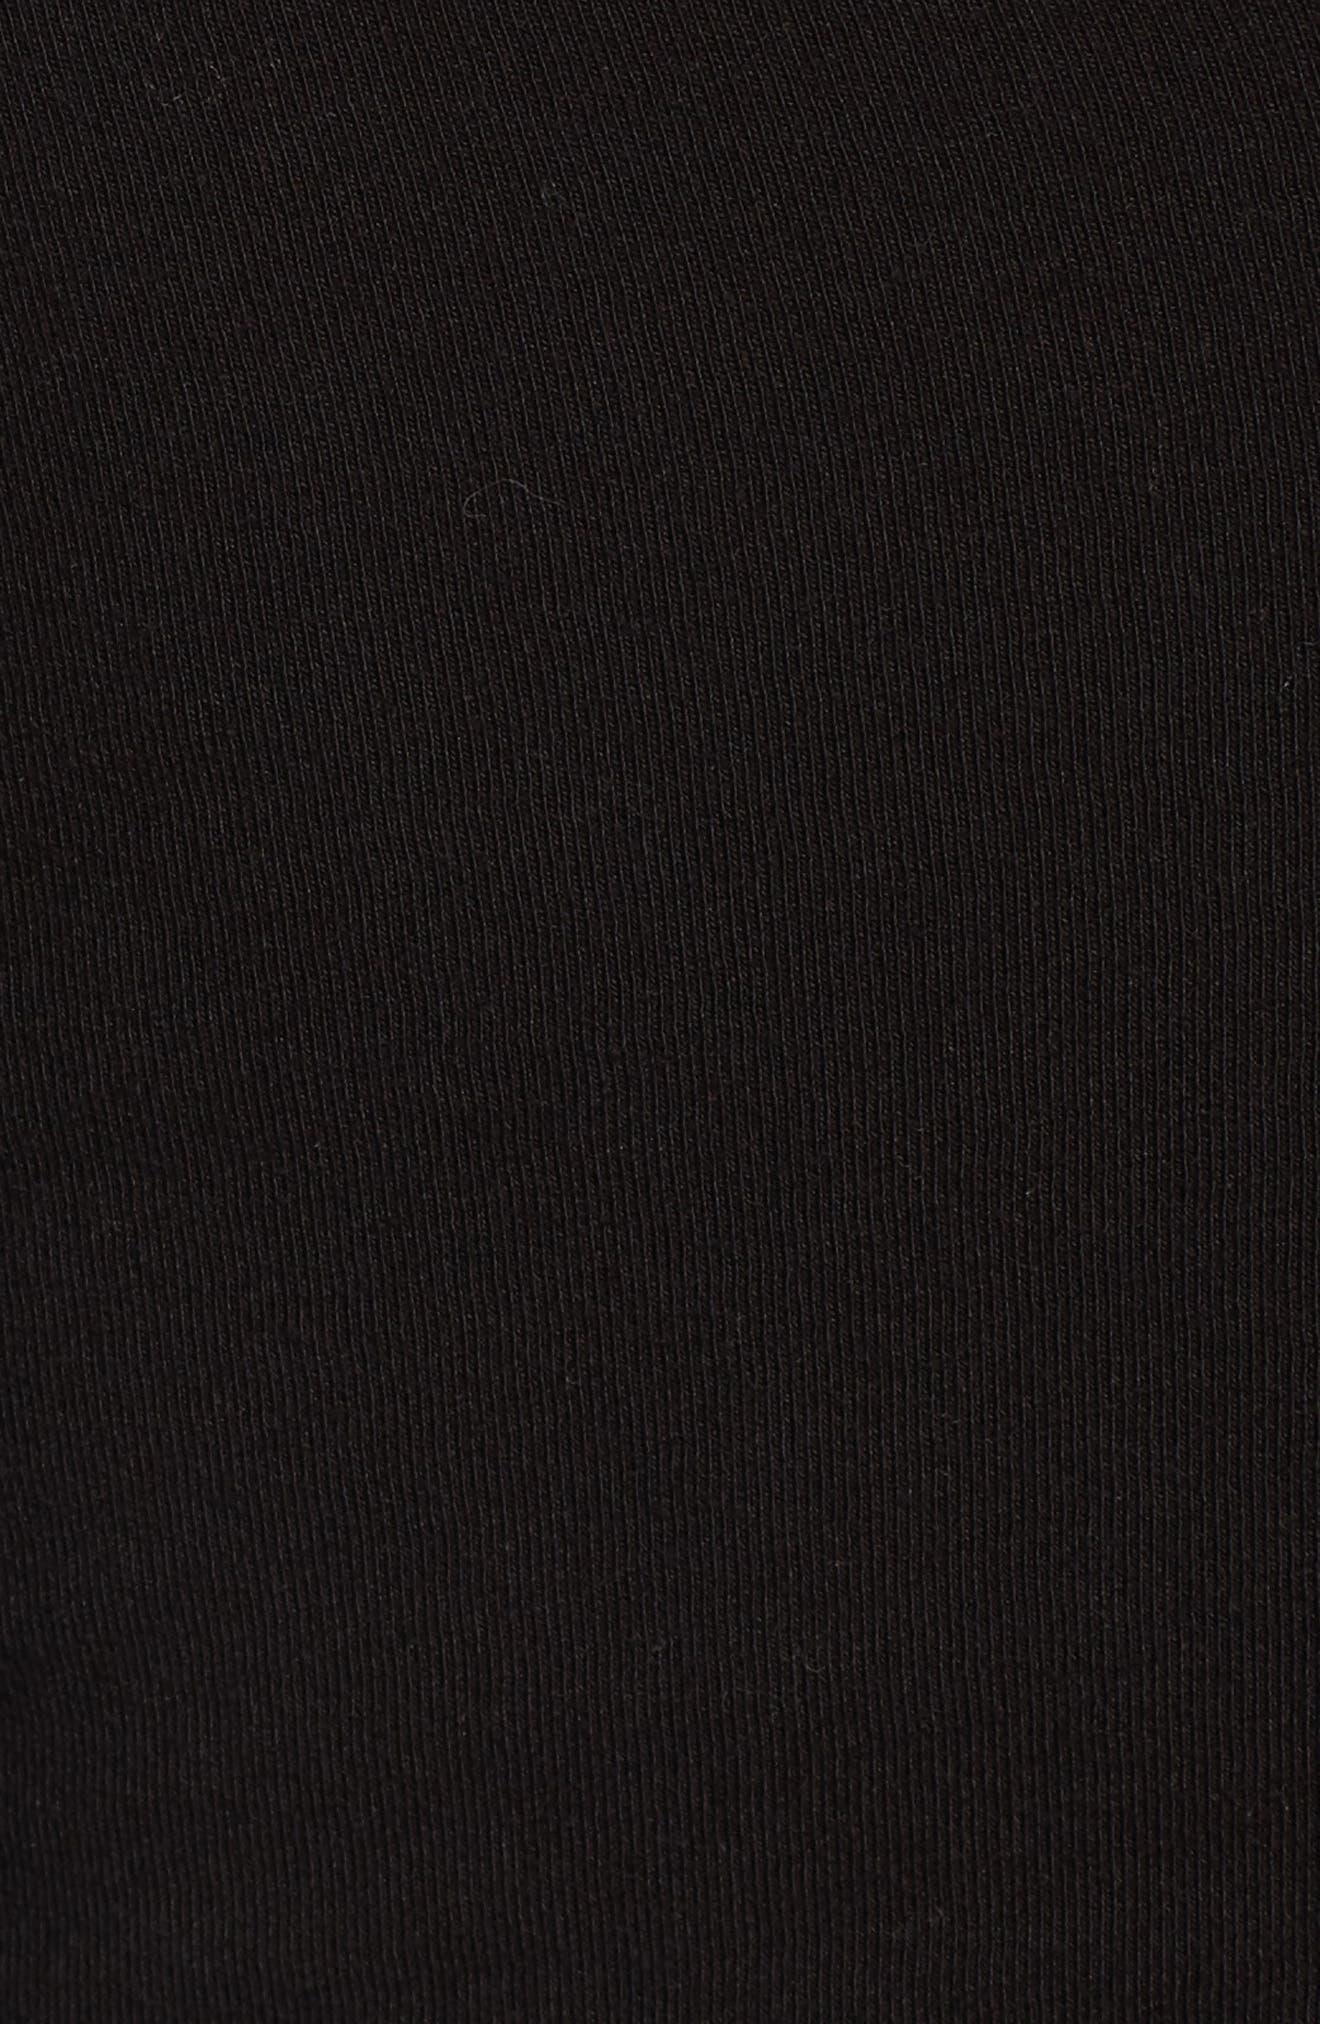 Tucked Faux Wrap Dress,                             Alternate thumbnail 6, color,                             001